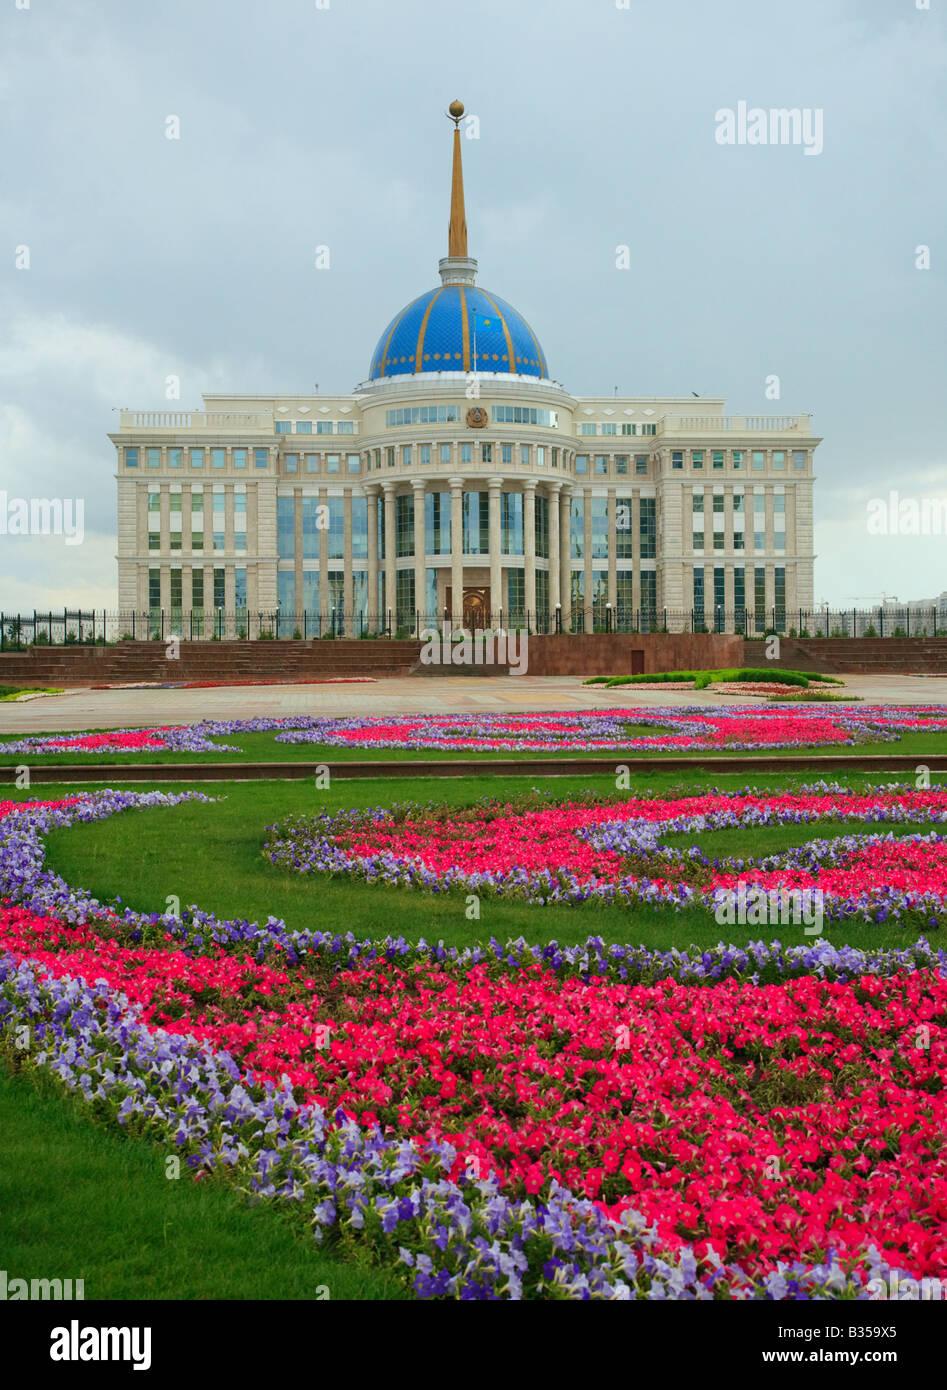 Palace of President of Kazakhstan Republic Astana Kazakhstan - Stock Image